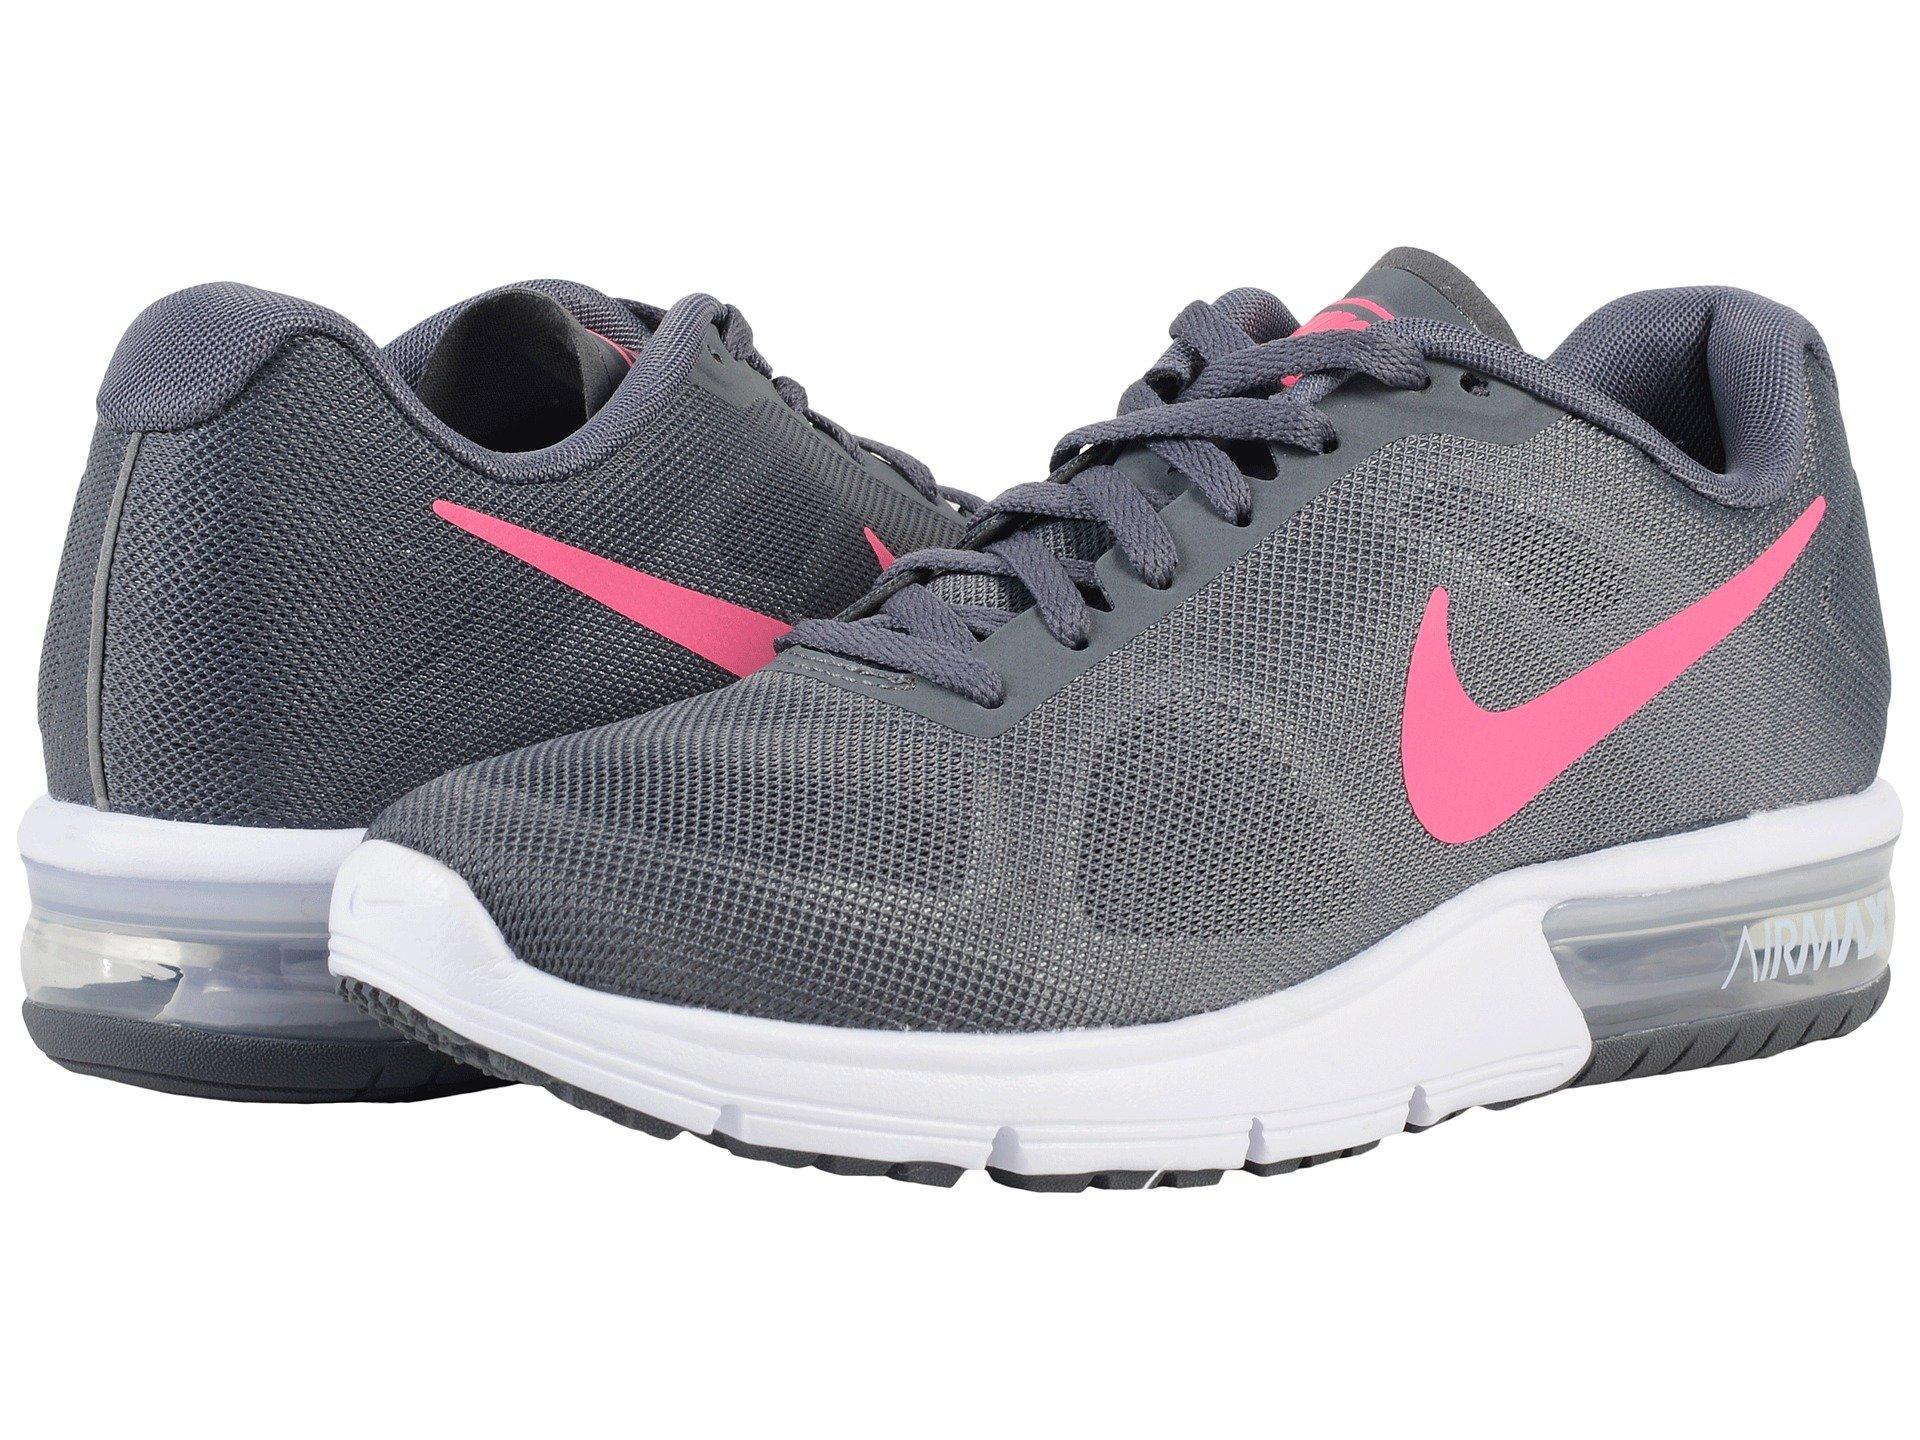 b24f57f87a51 Nike Air Max Sequent In Dark Grey White Black Hyper Pink